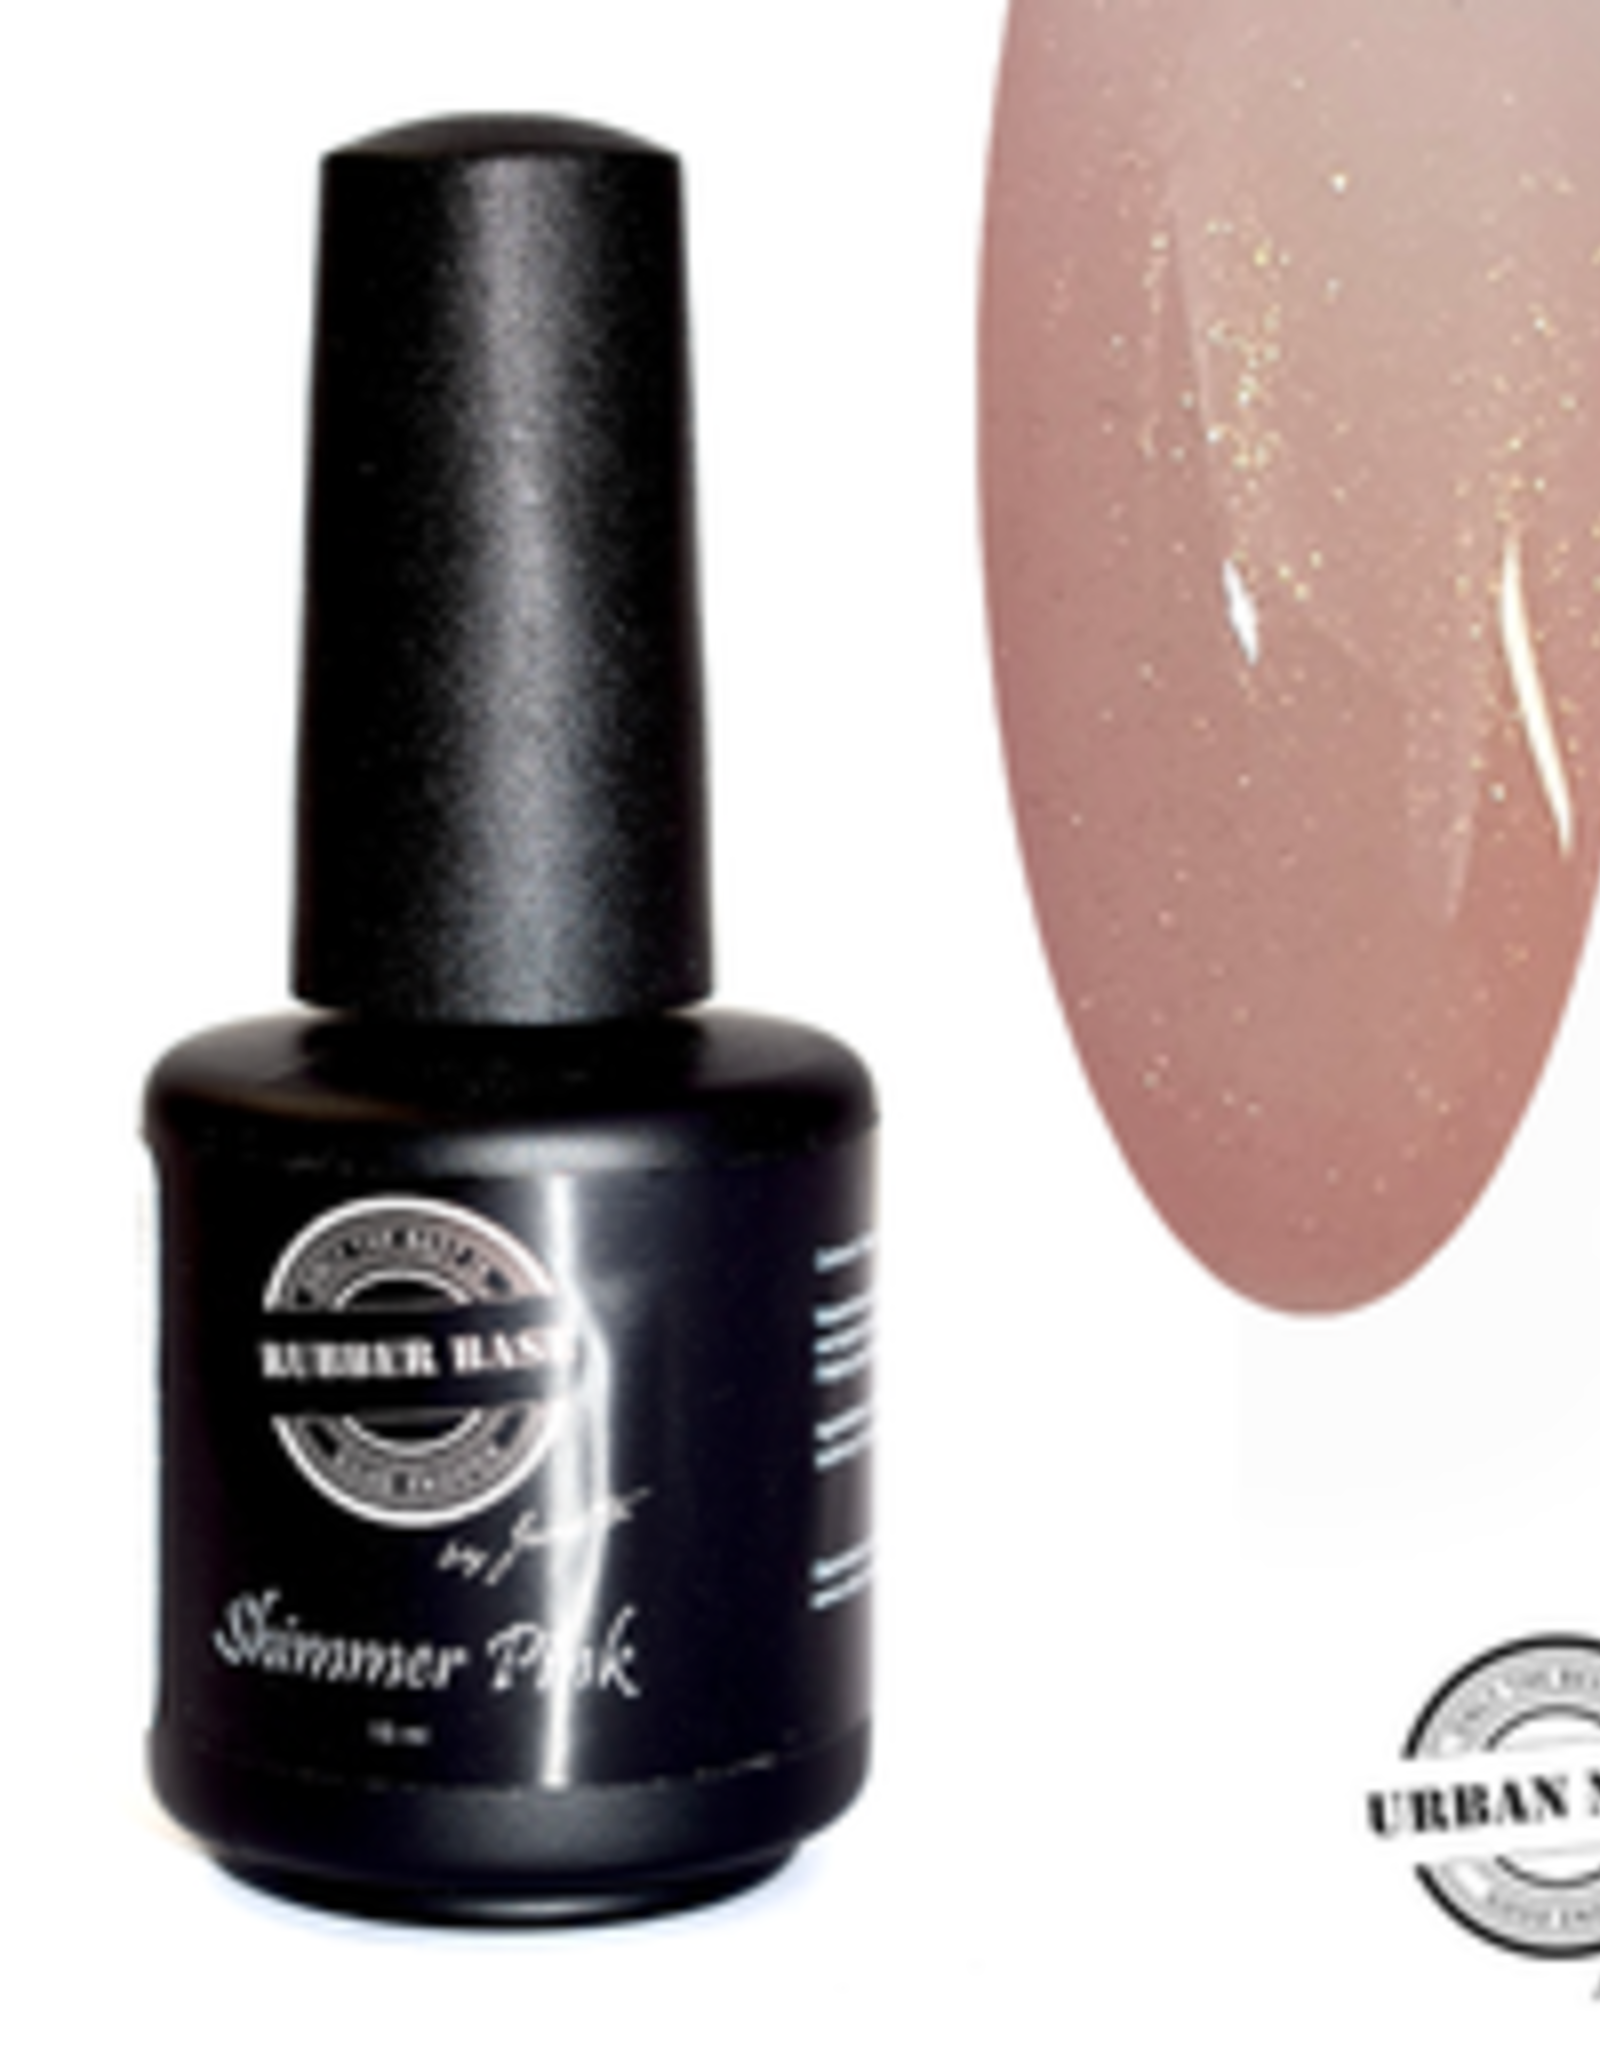 Urban Nails Rubber Base Shimmer Pink Gold